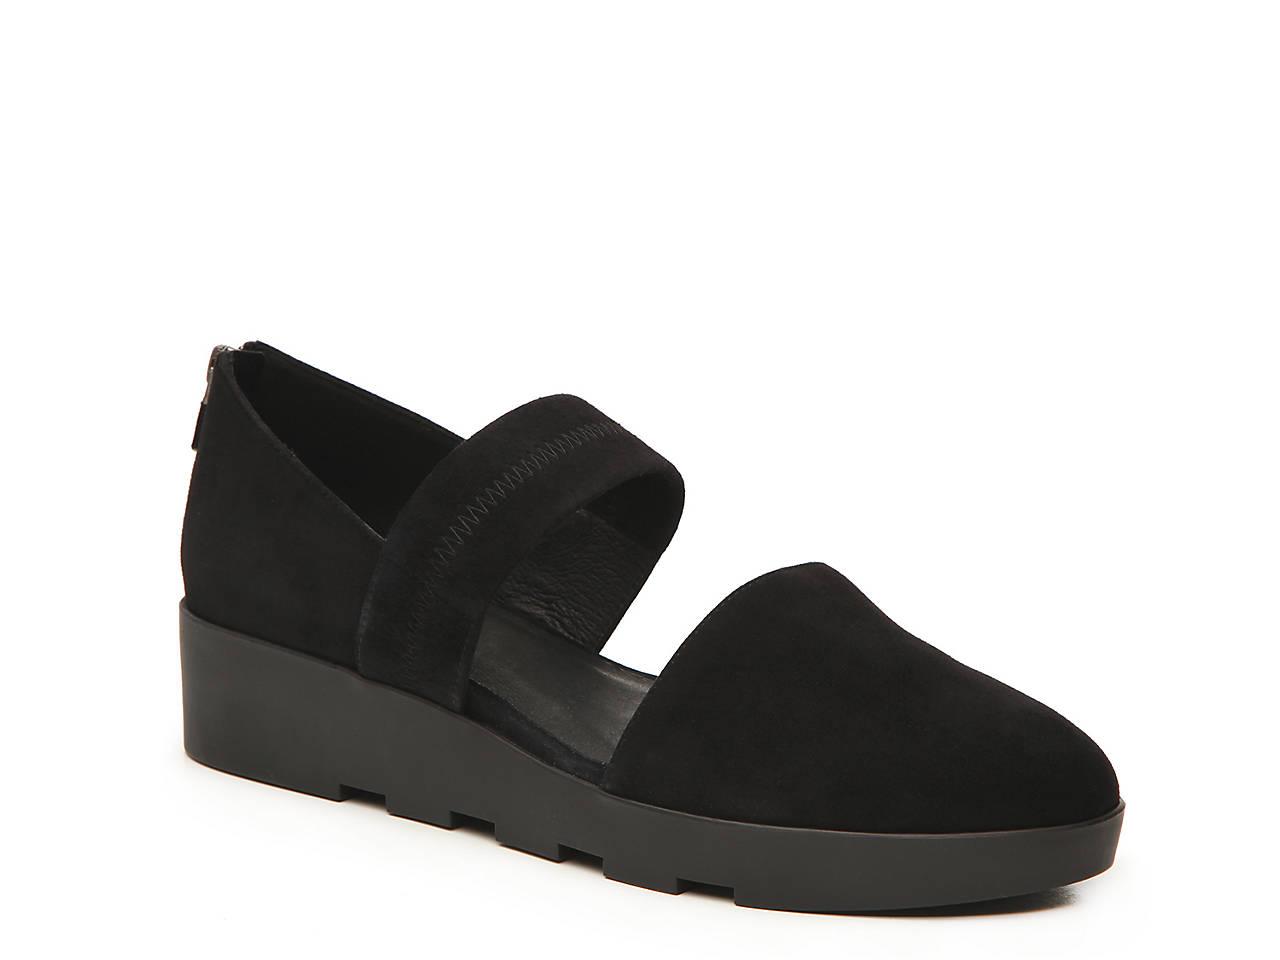 08e60efb6e3 Eileen Fisher Marlow Wedge Slip-On Women s Shoes